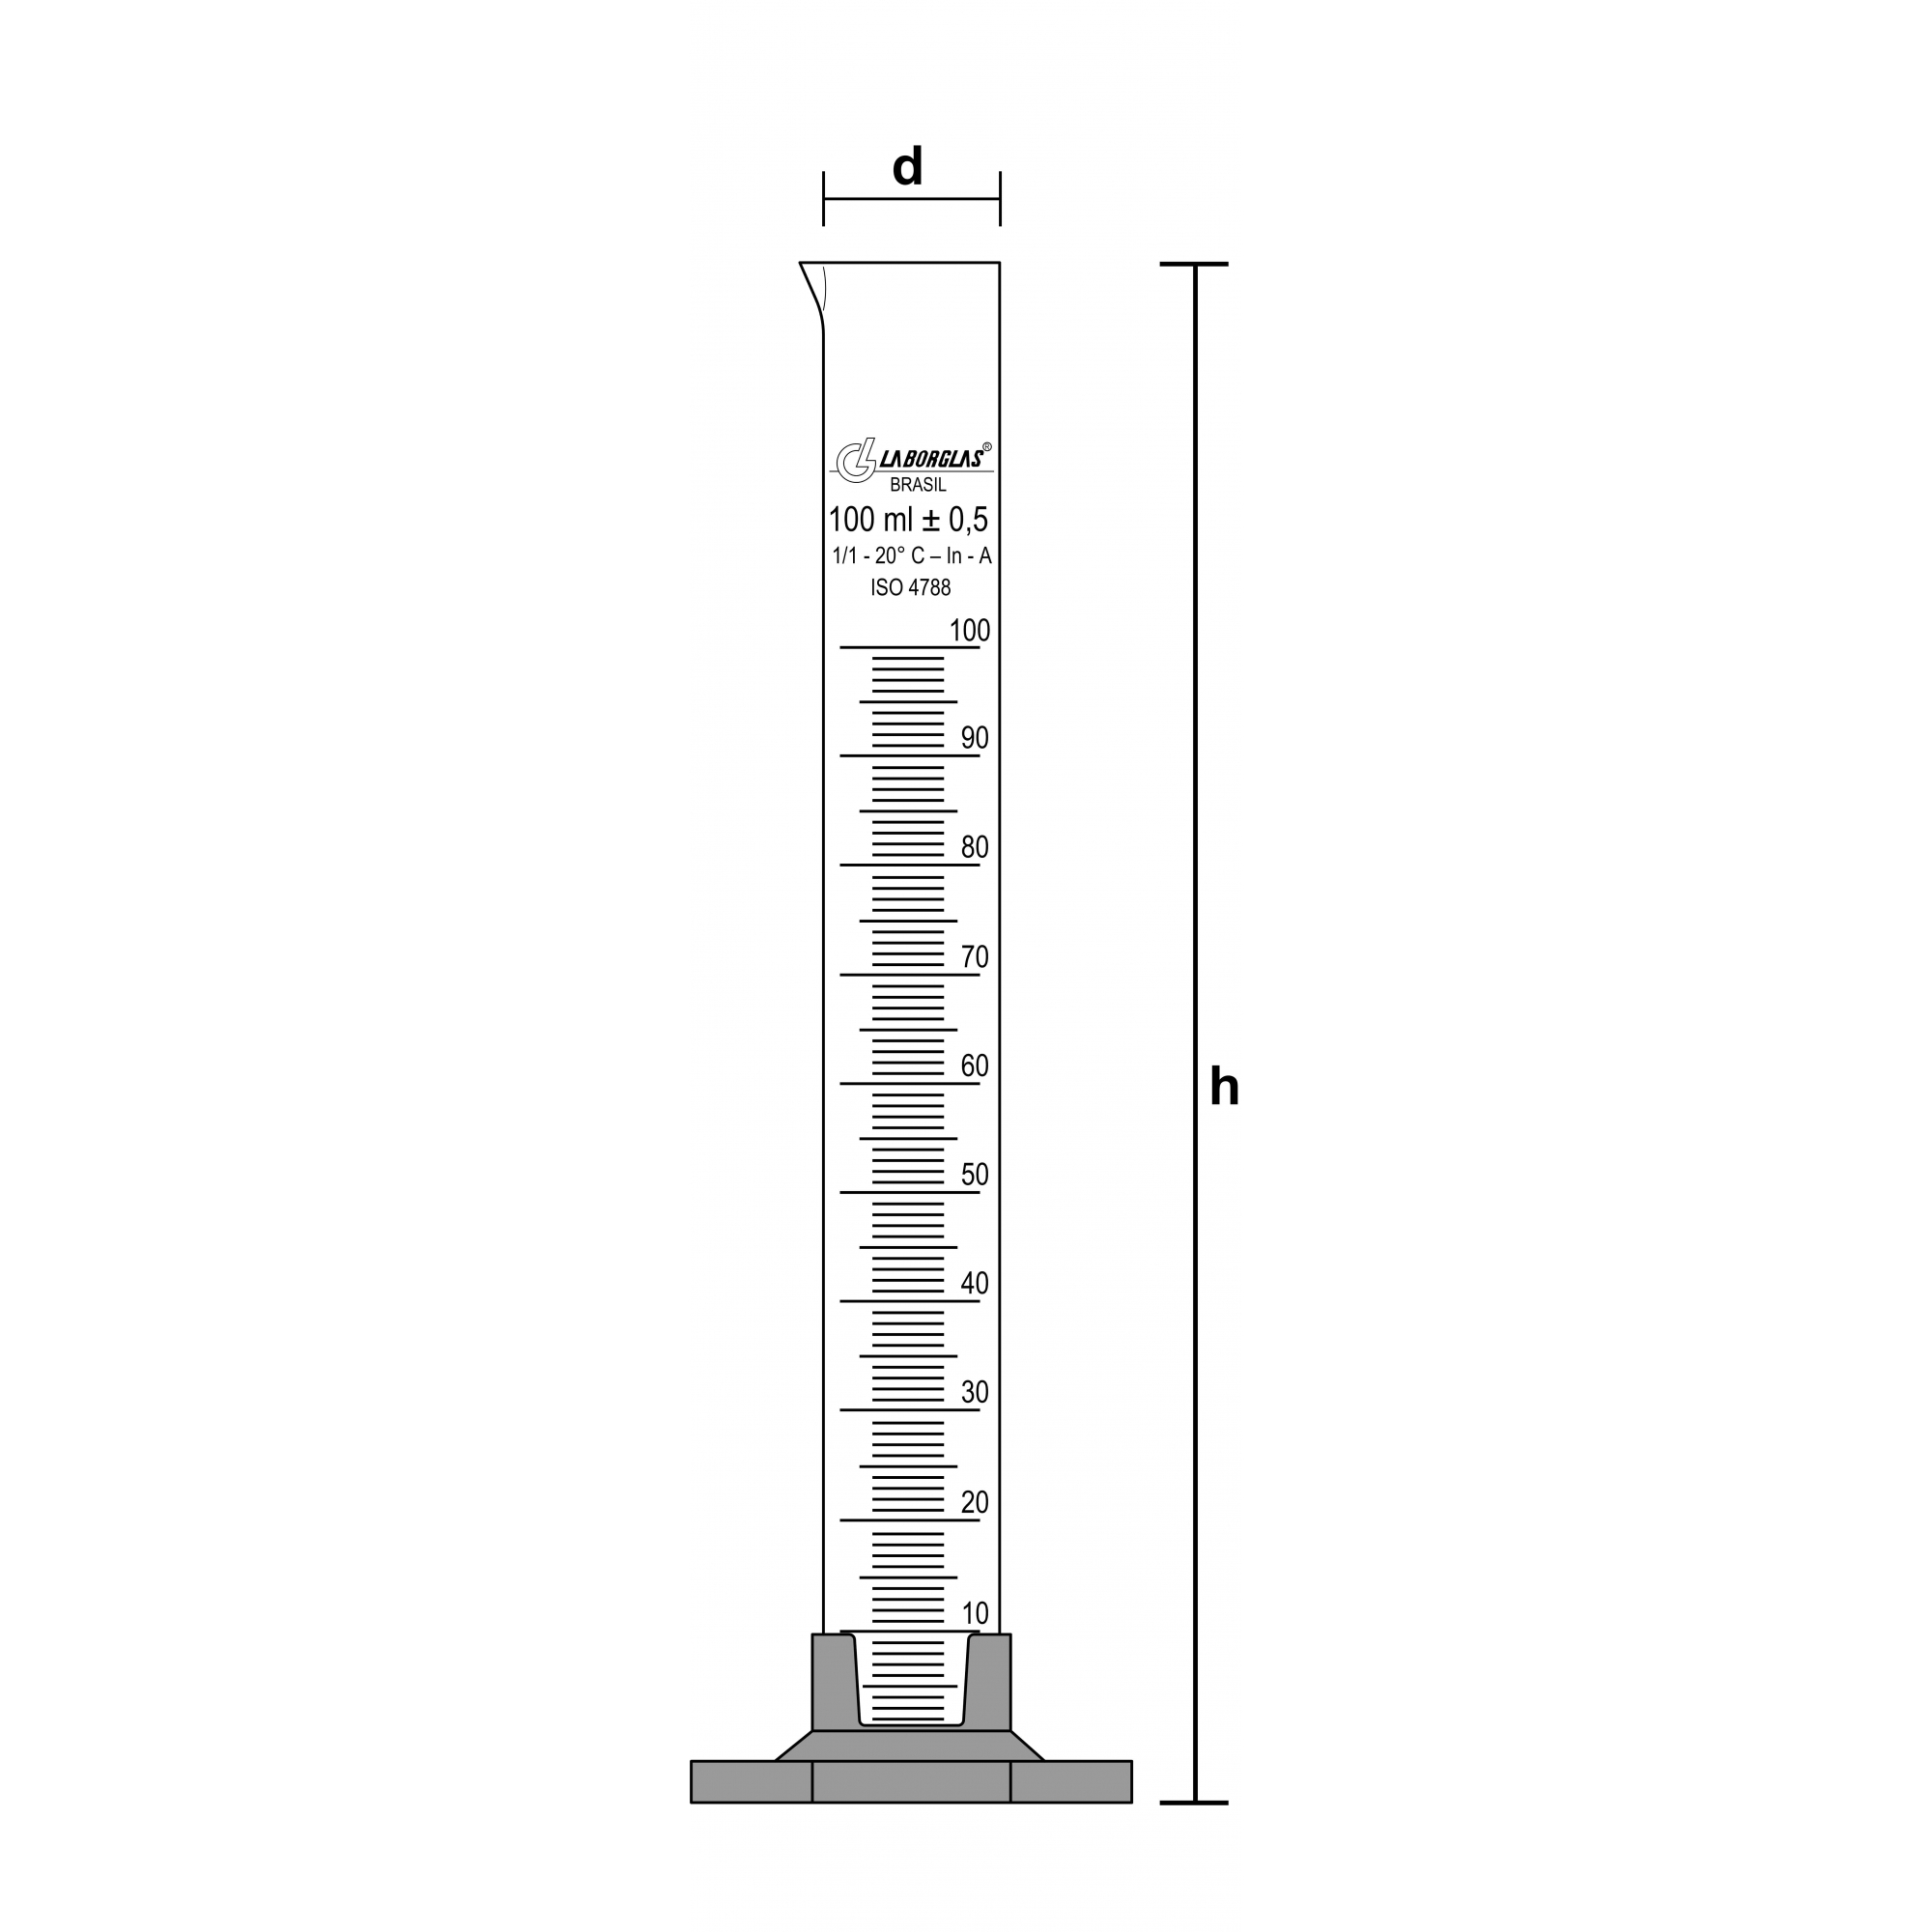 PROVETA GRADUADA BASE HEXAGONAL DE POLIPROPILENO 500 ML CLASSE A CERTIFICADO RBC - Laborglas - Cód. 9138744-R